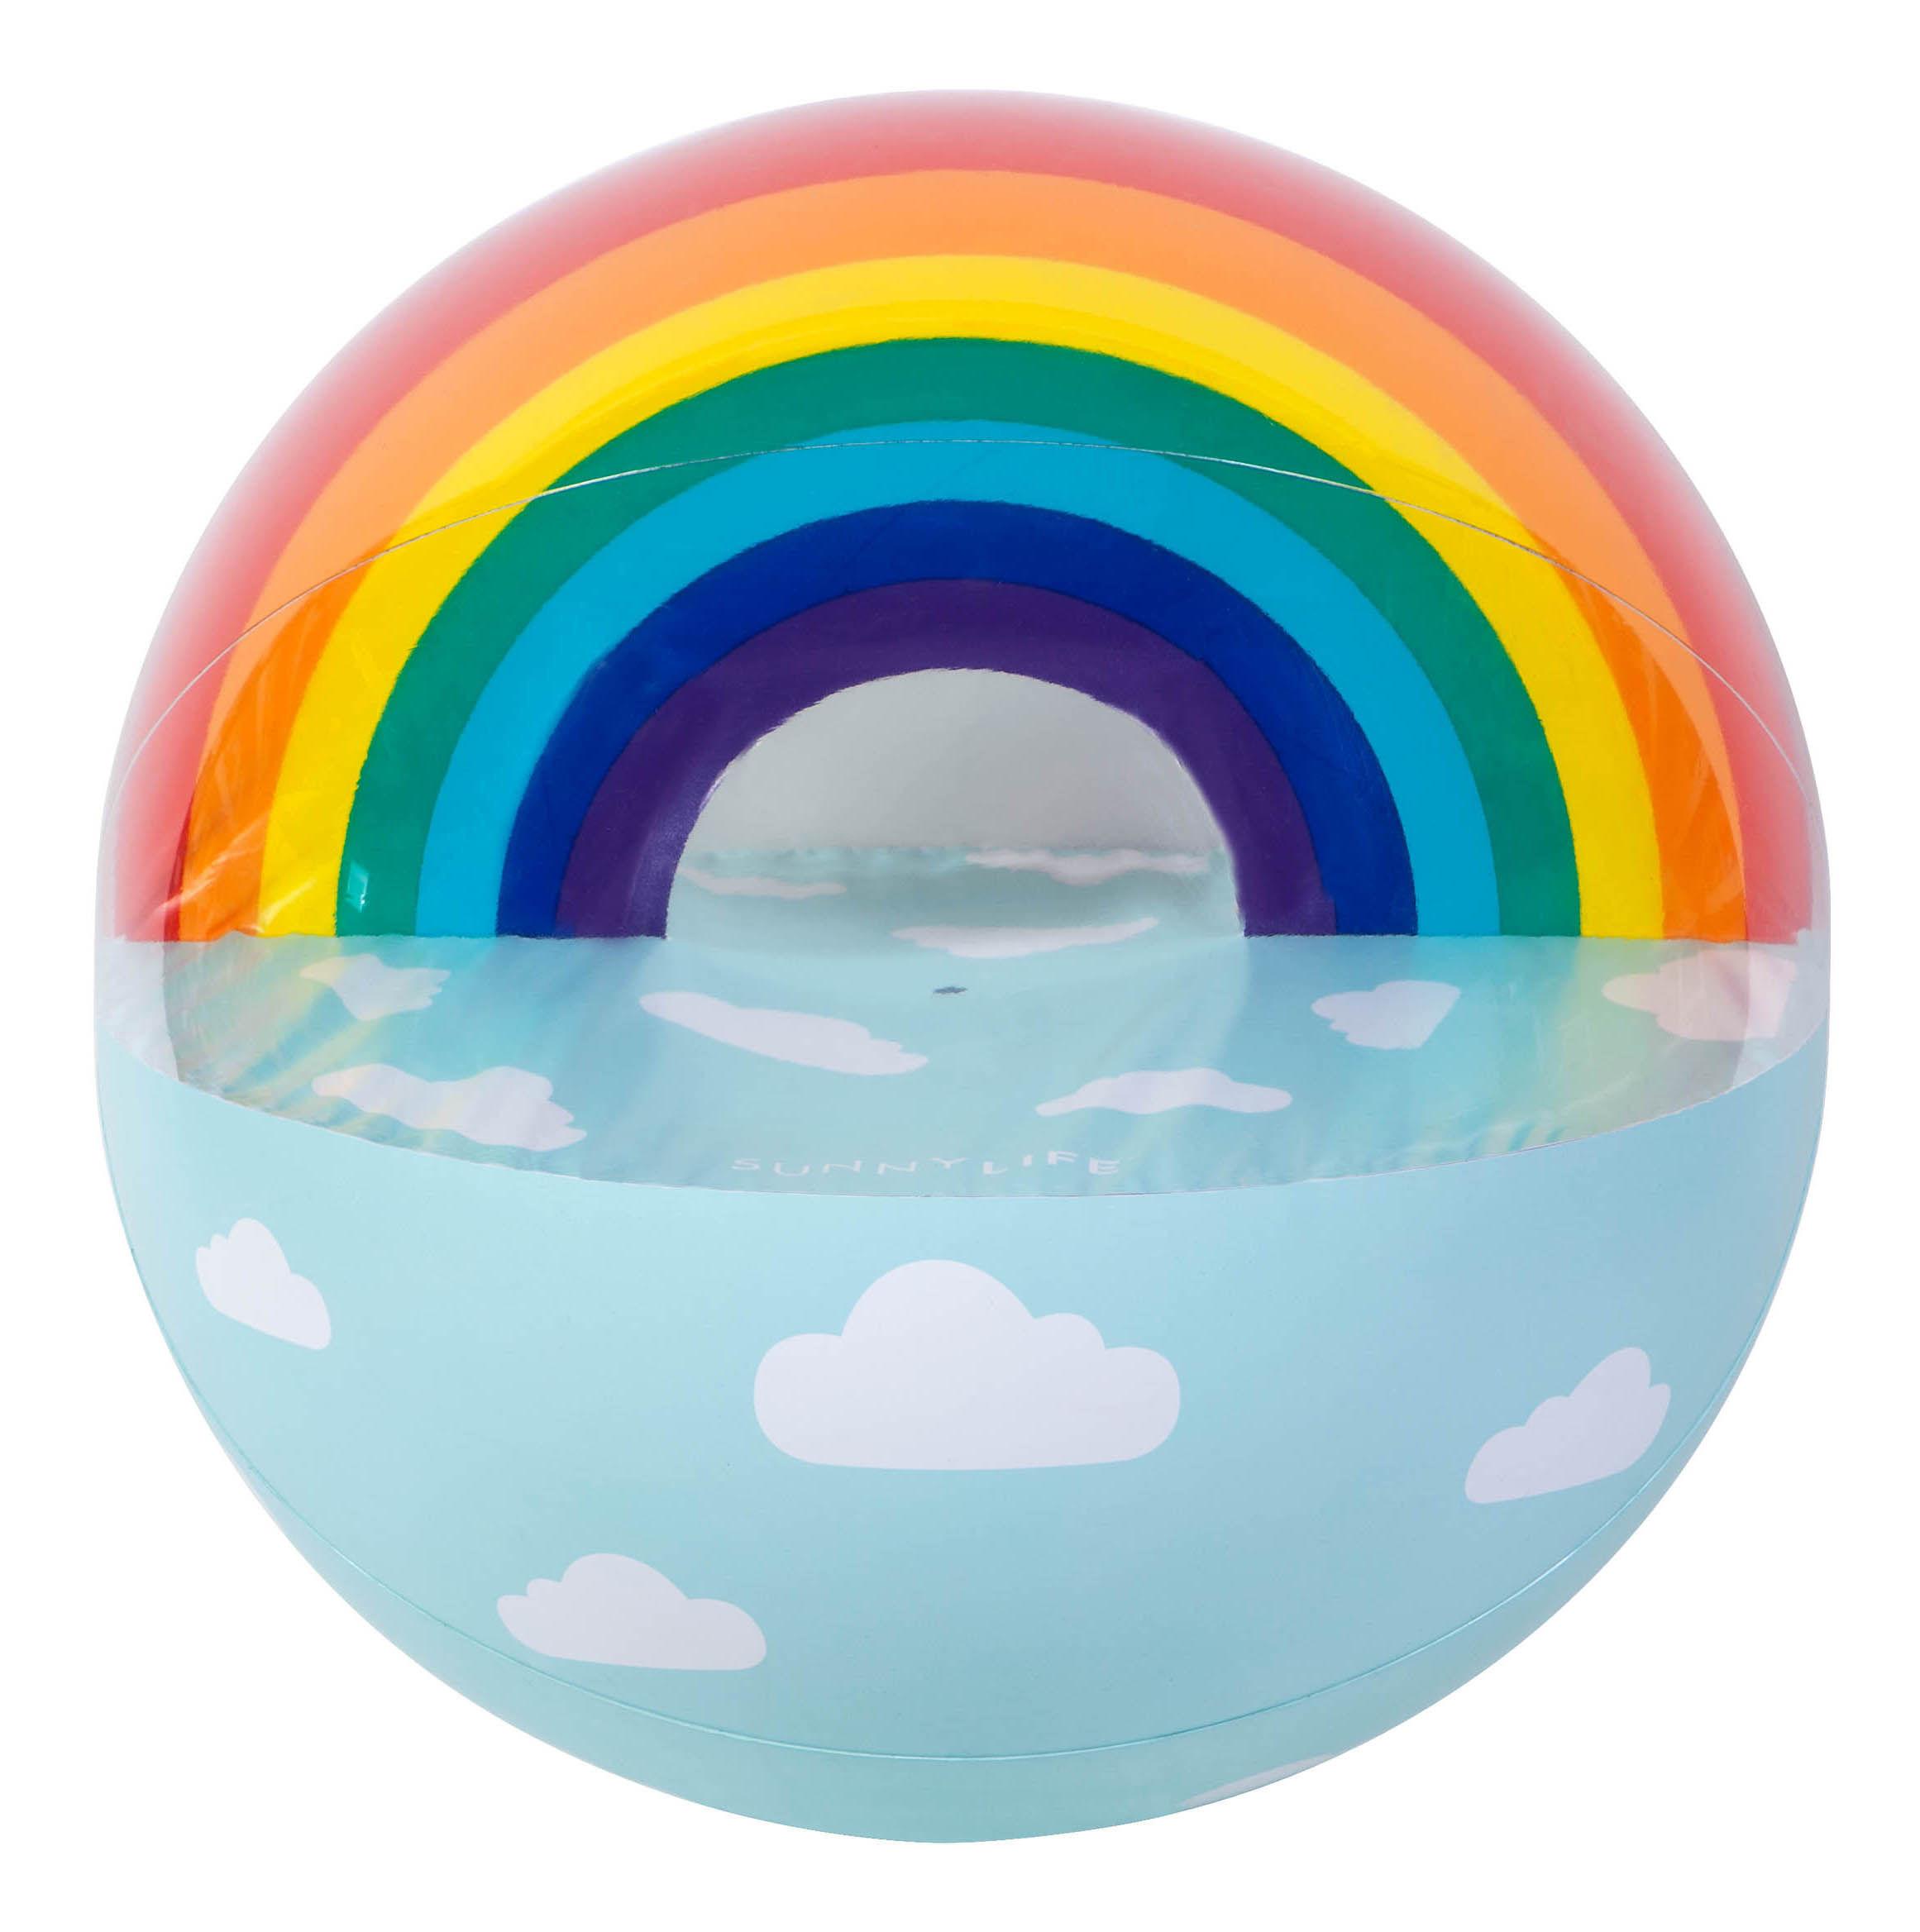 Decoration - Children's Home Accessories - Arc-en-ciel Inflatable balloon - giant / Rainbow - Inflatable - Ø 90 cm by Sunnylife - Rainbow - High resistance PVC